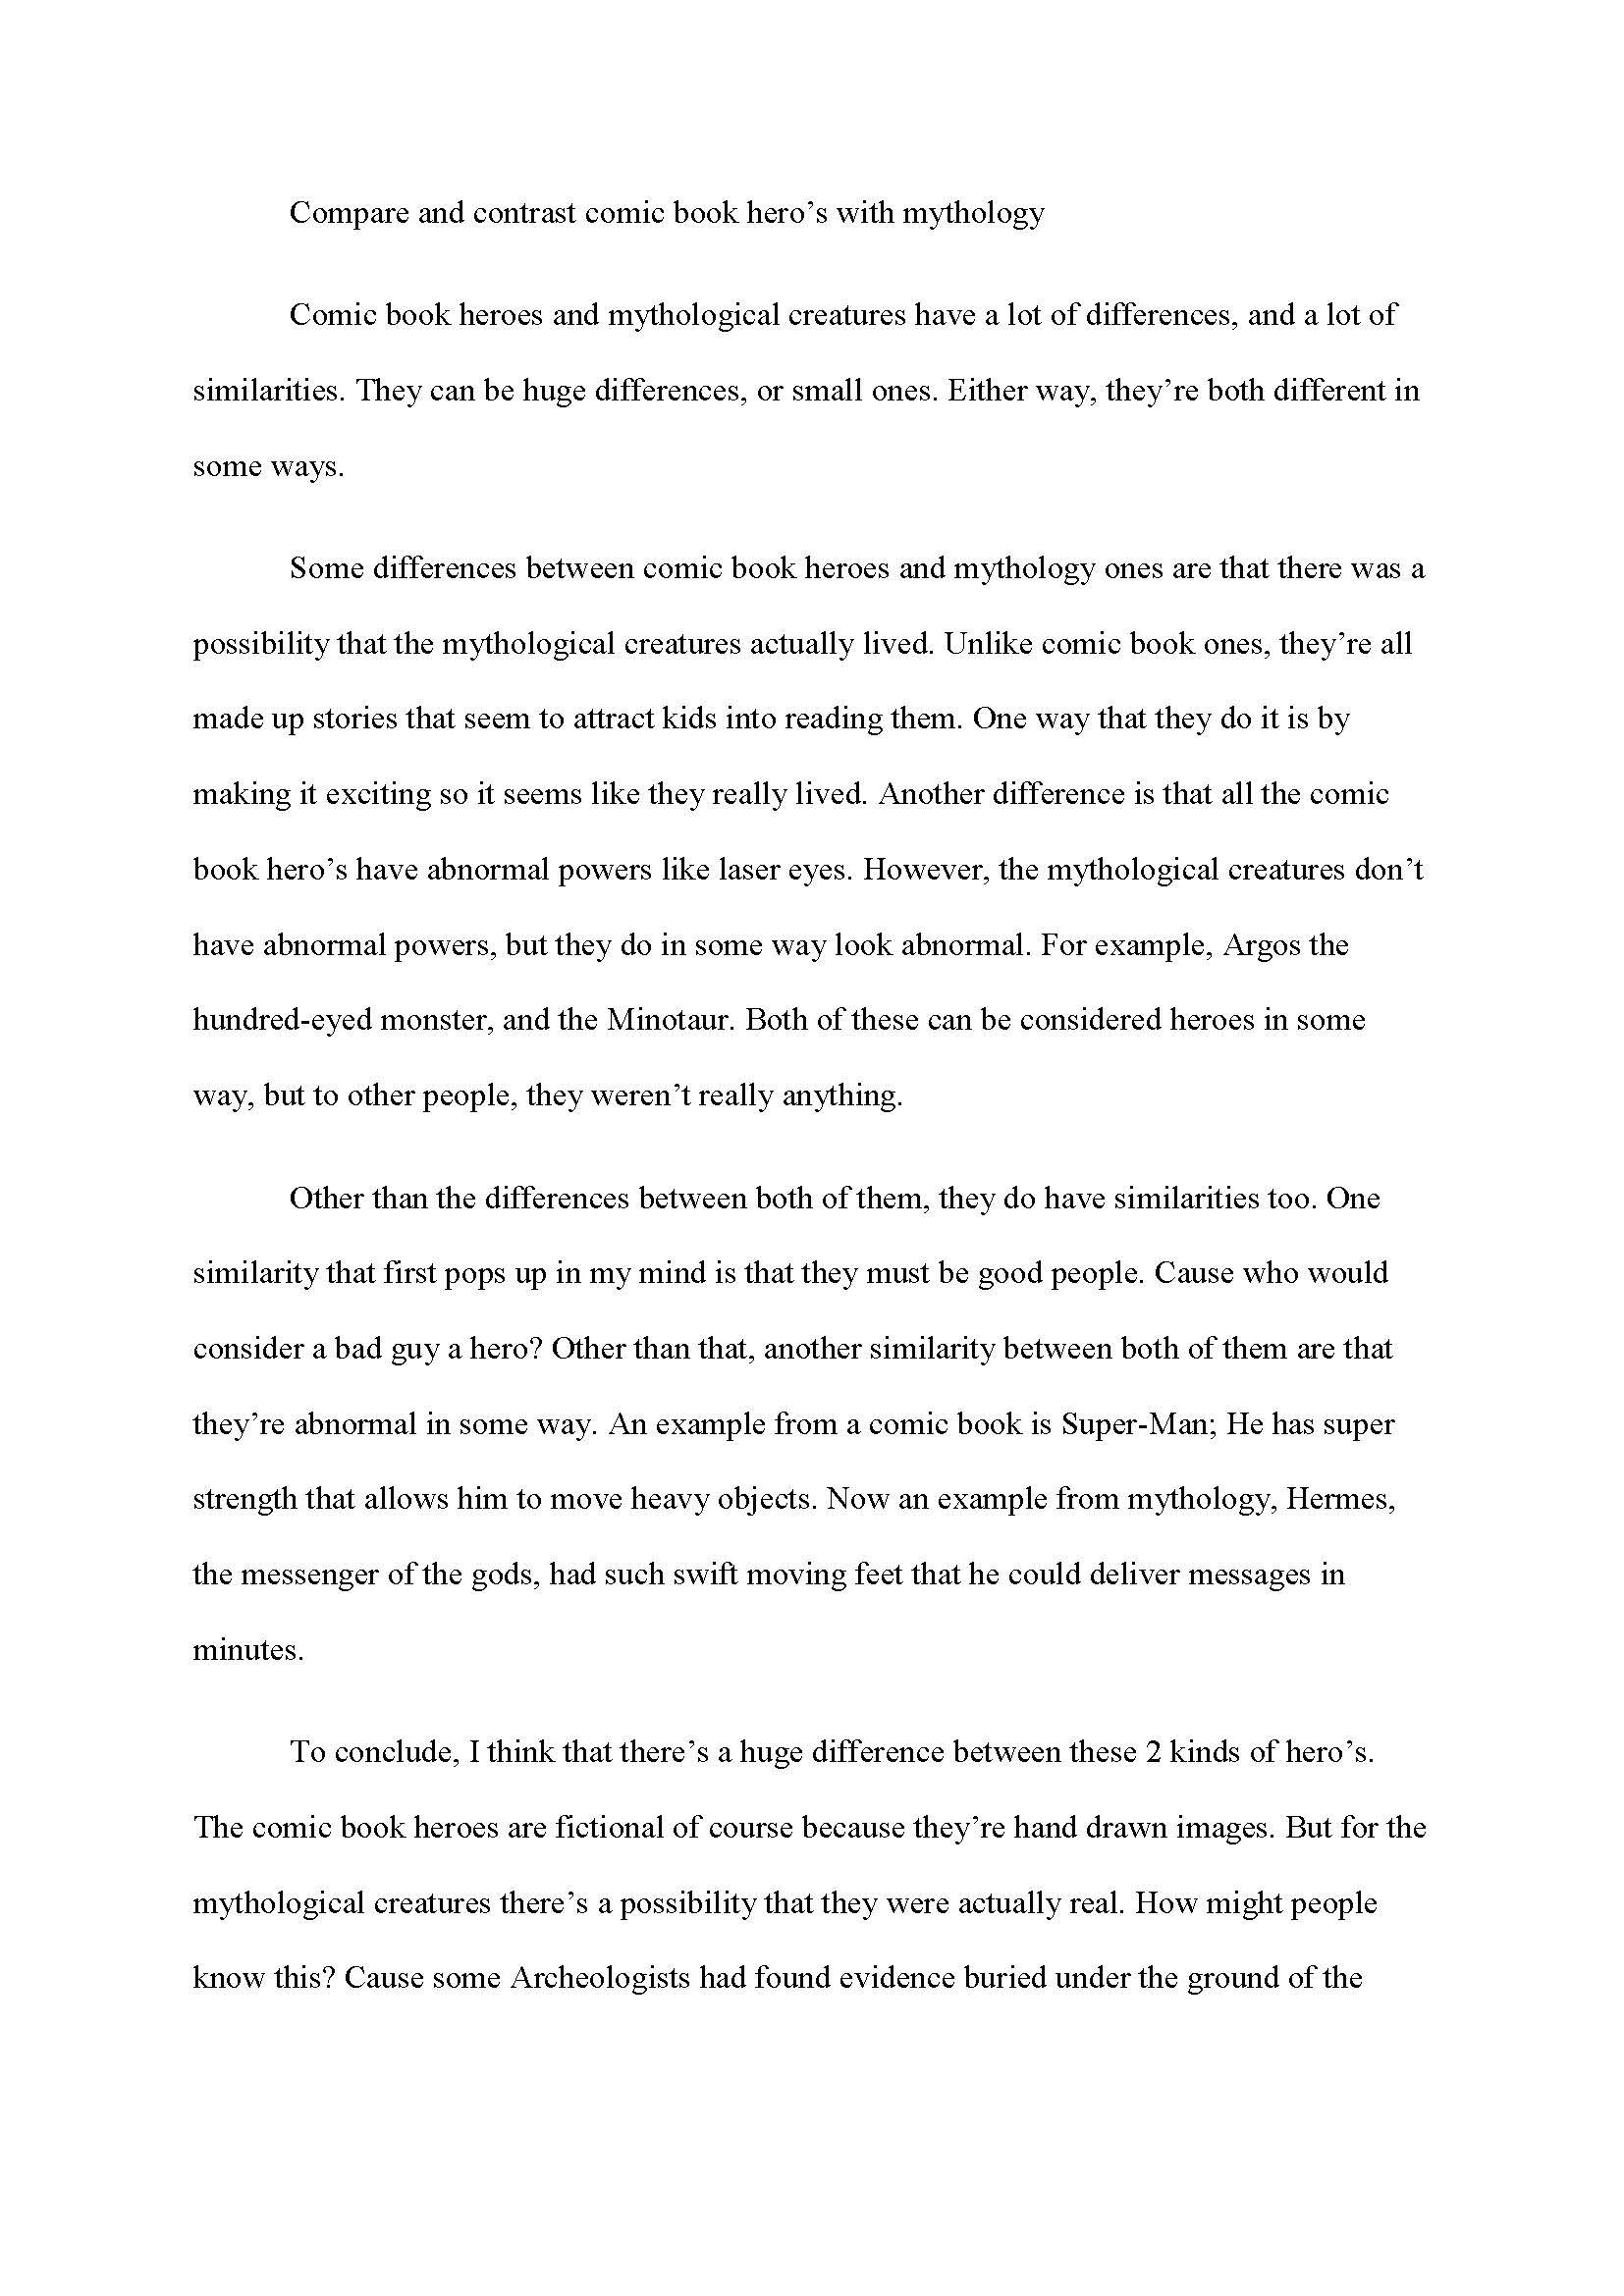 001 Compare And Contrast Essay Samples Unusual Examples High School Vs College Comparison Pdf Topics 6th Grade Full